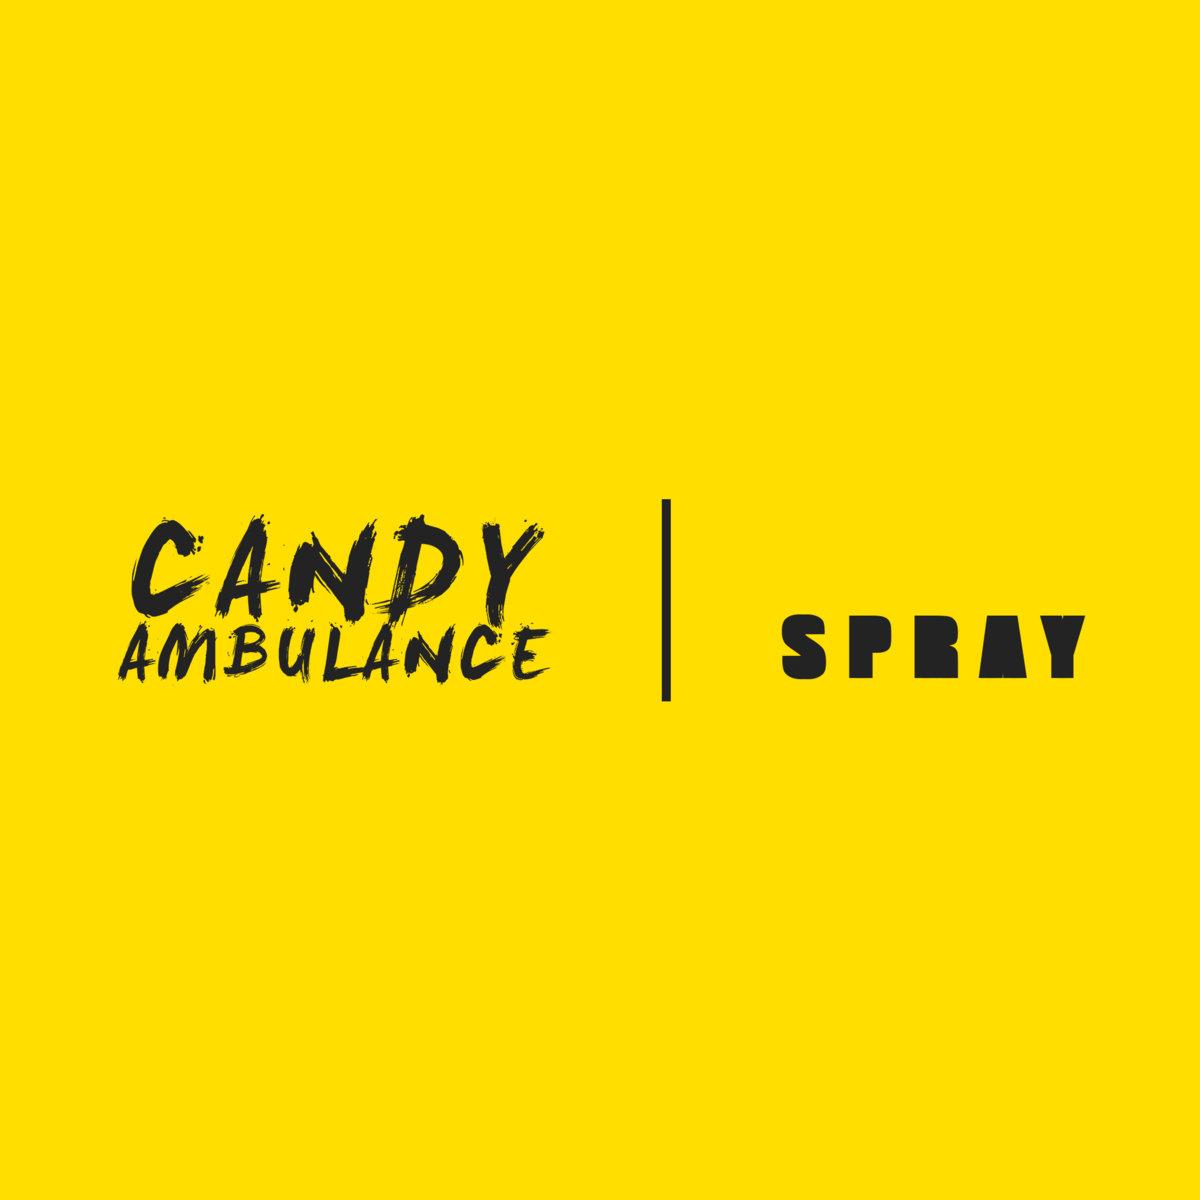 Candy Ambulance - Spray